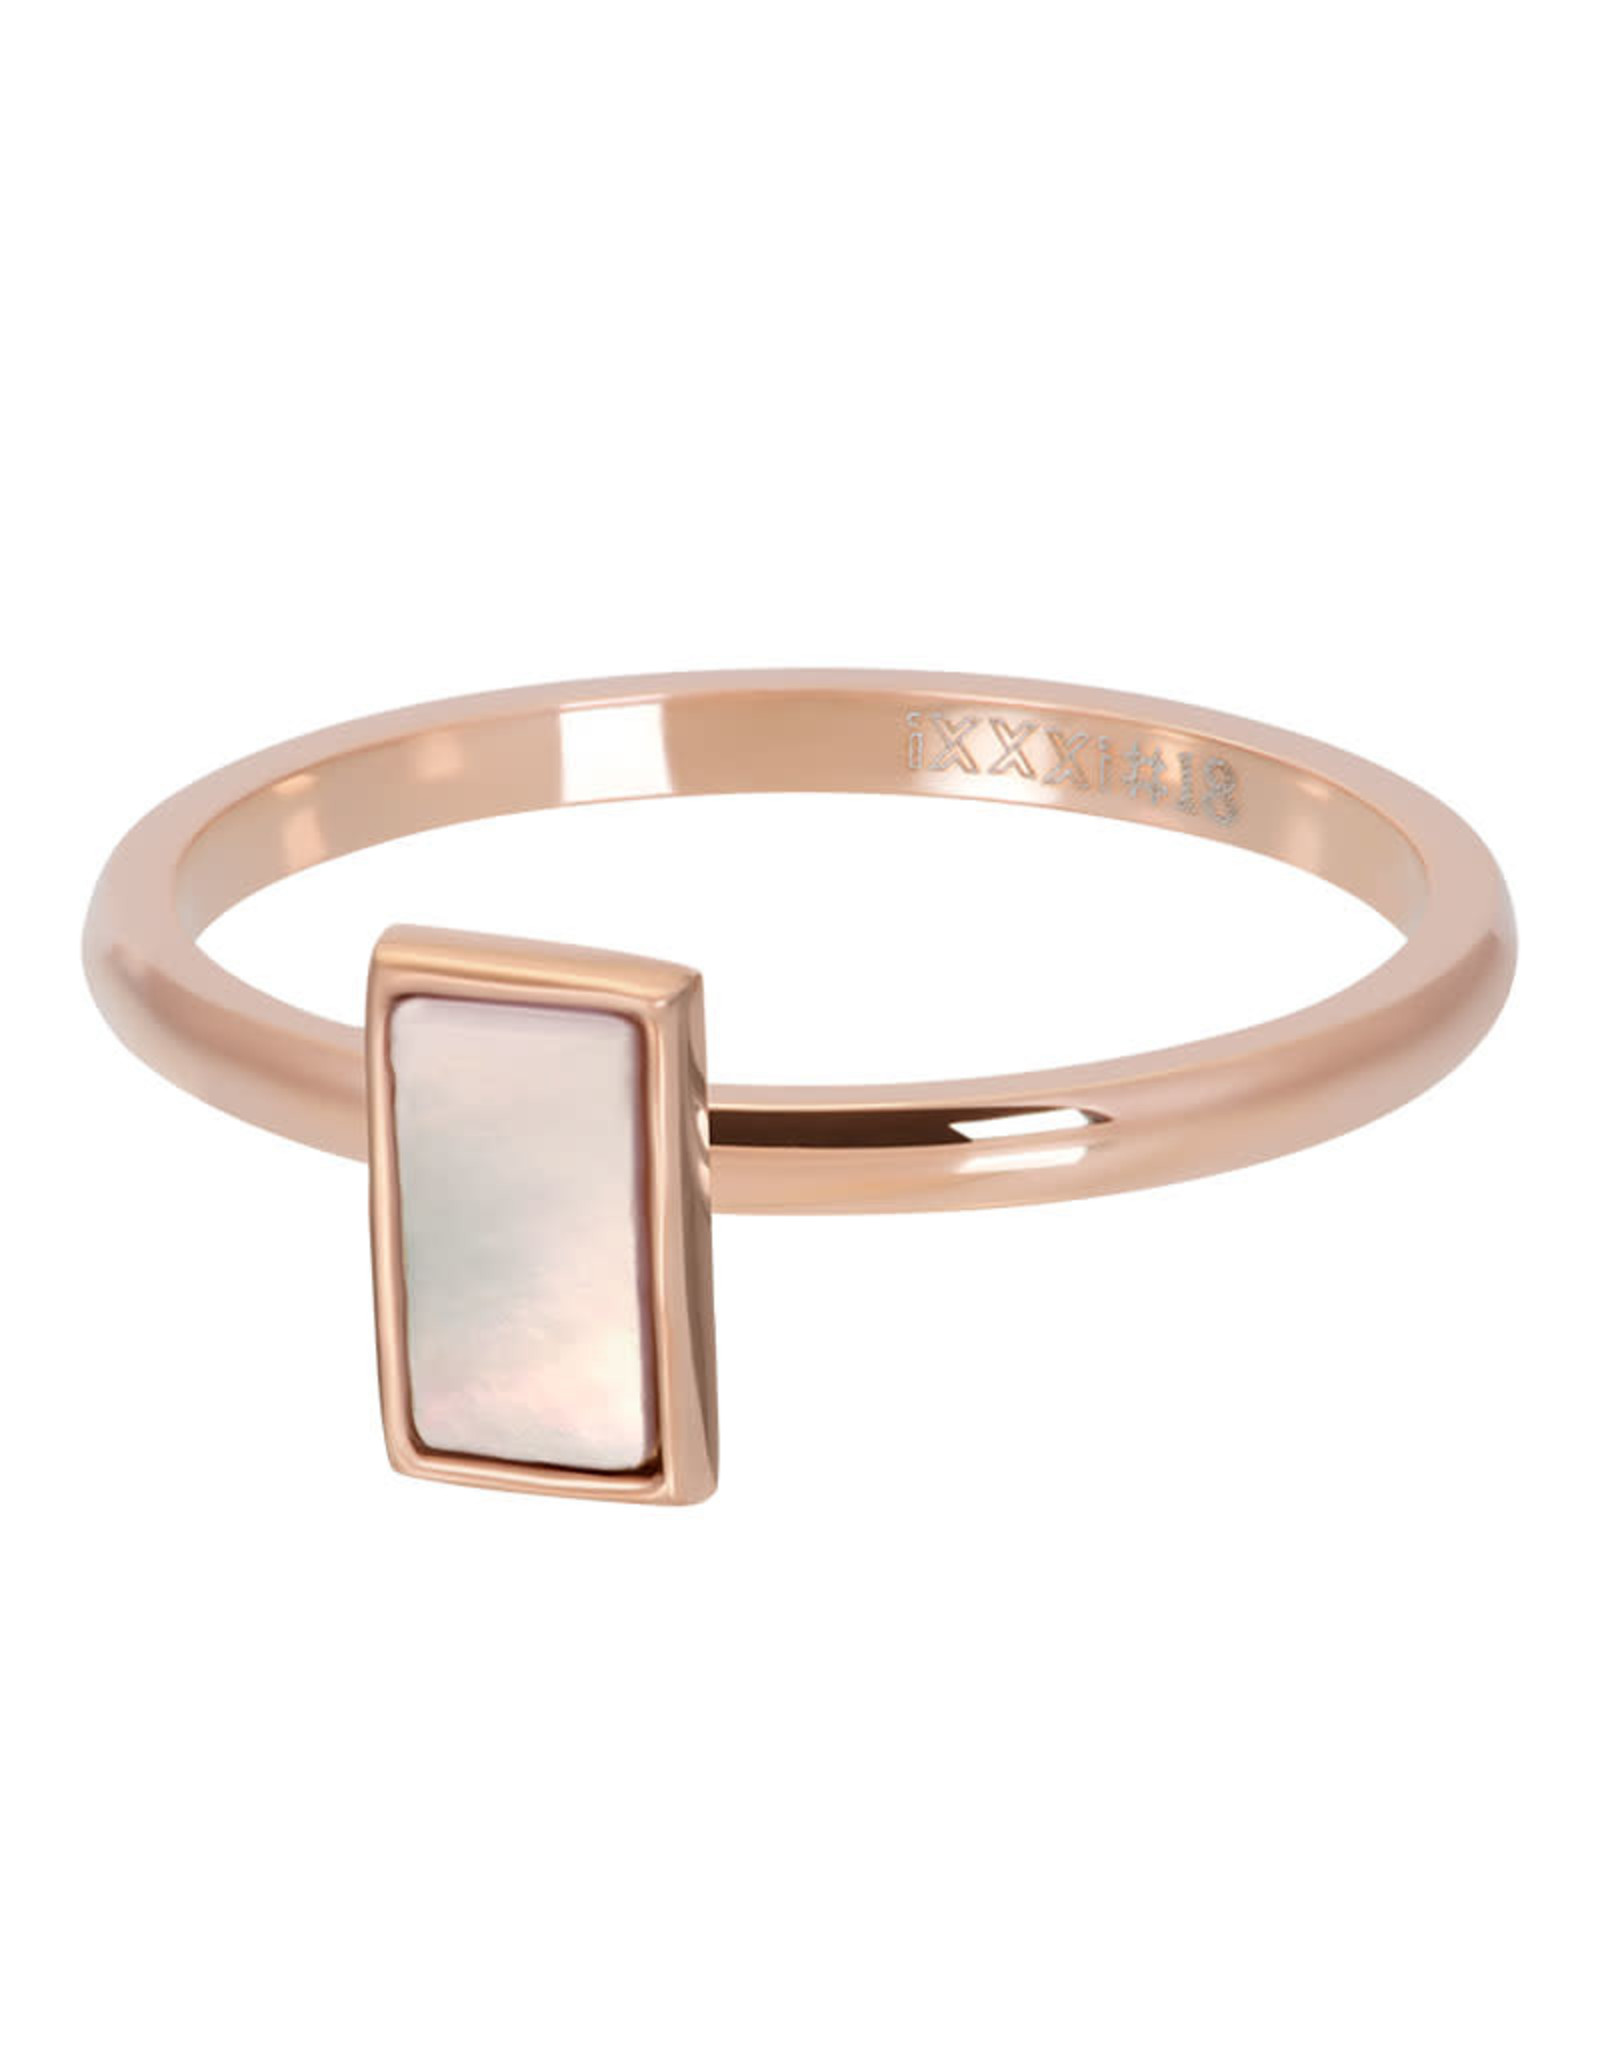 iXXXi ringen iXXXi Vulring shell stone - 3 kleuren